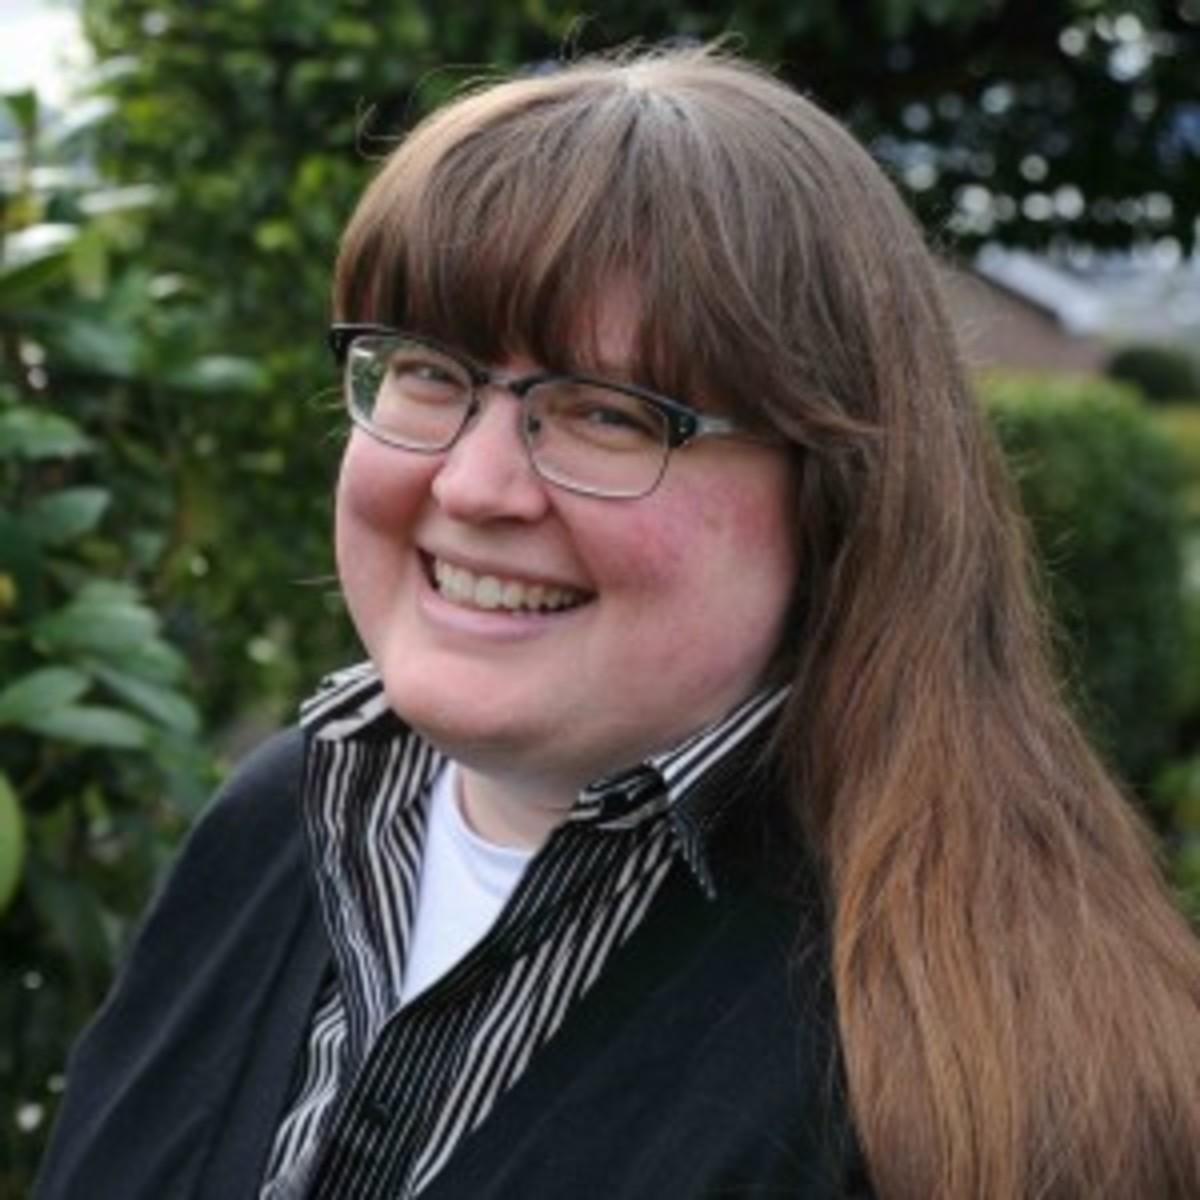 Amanda Laughtland